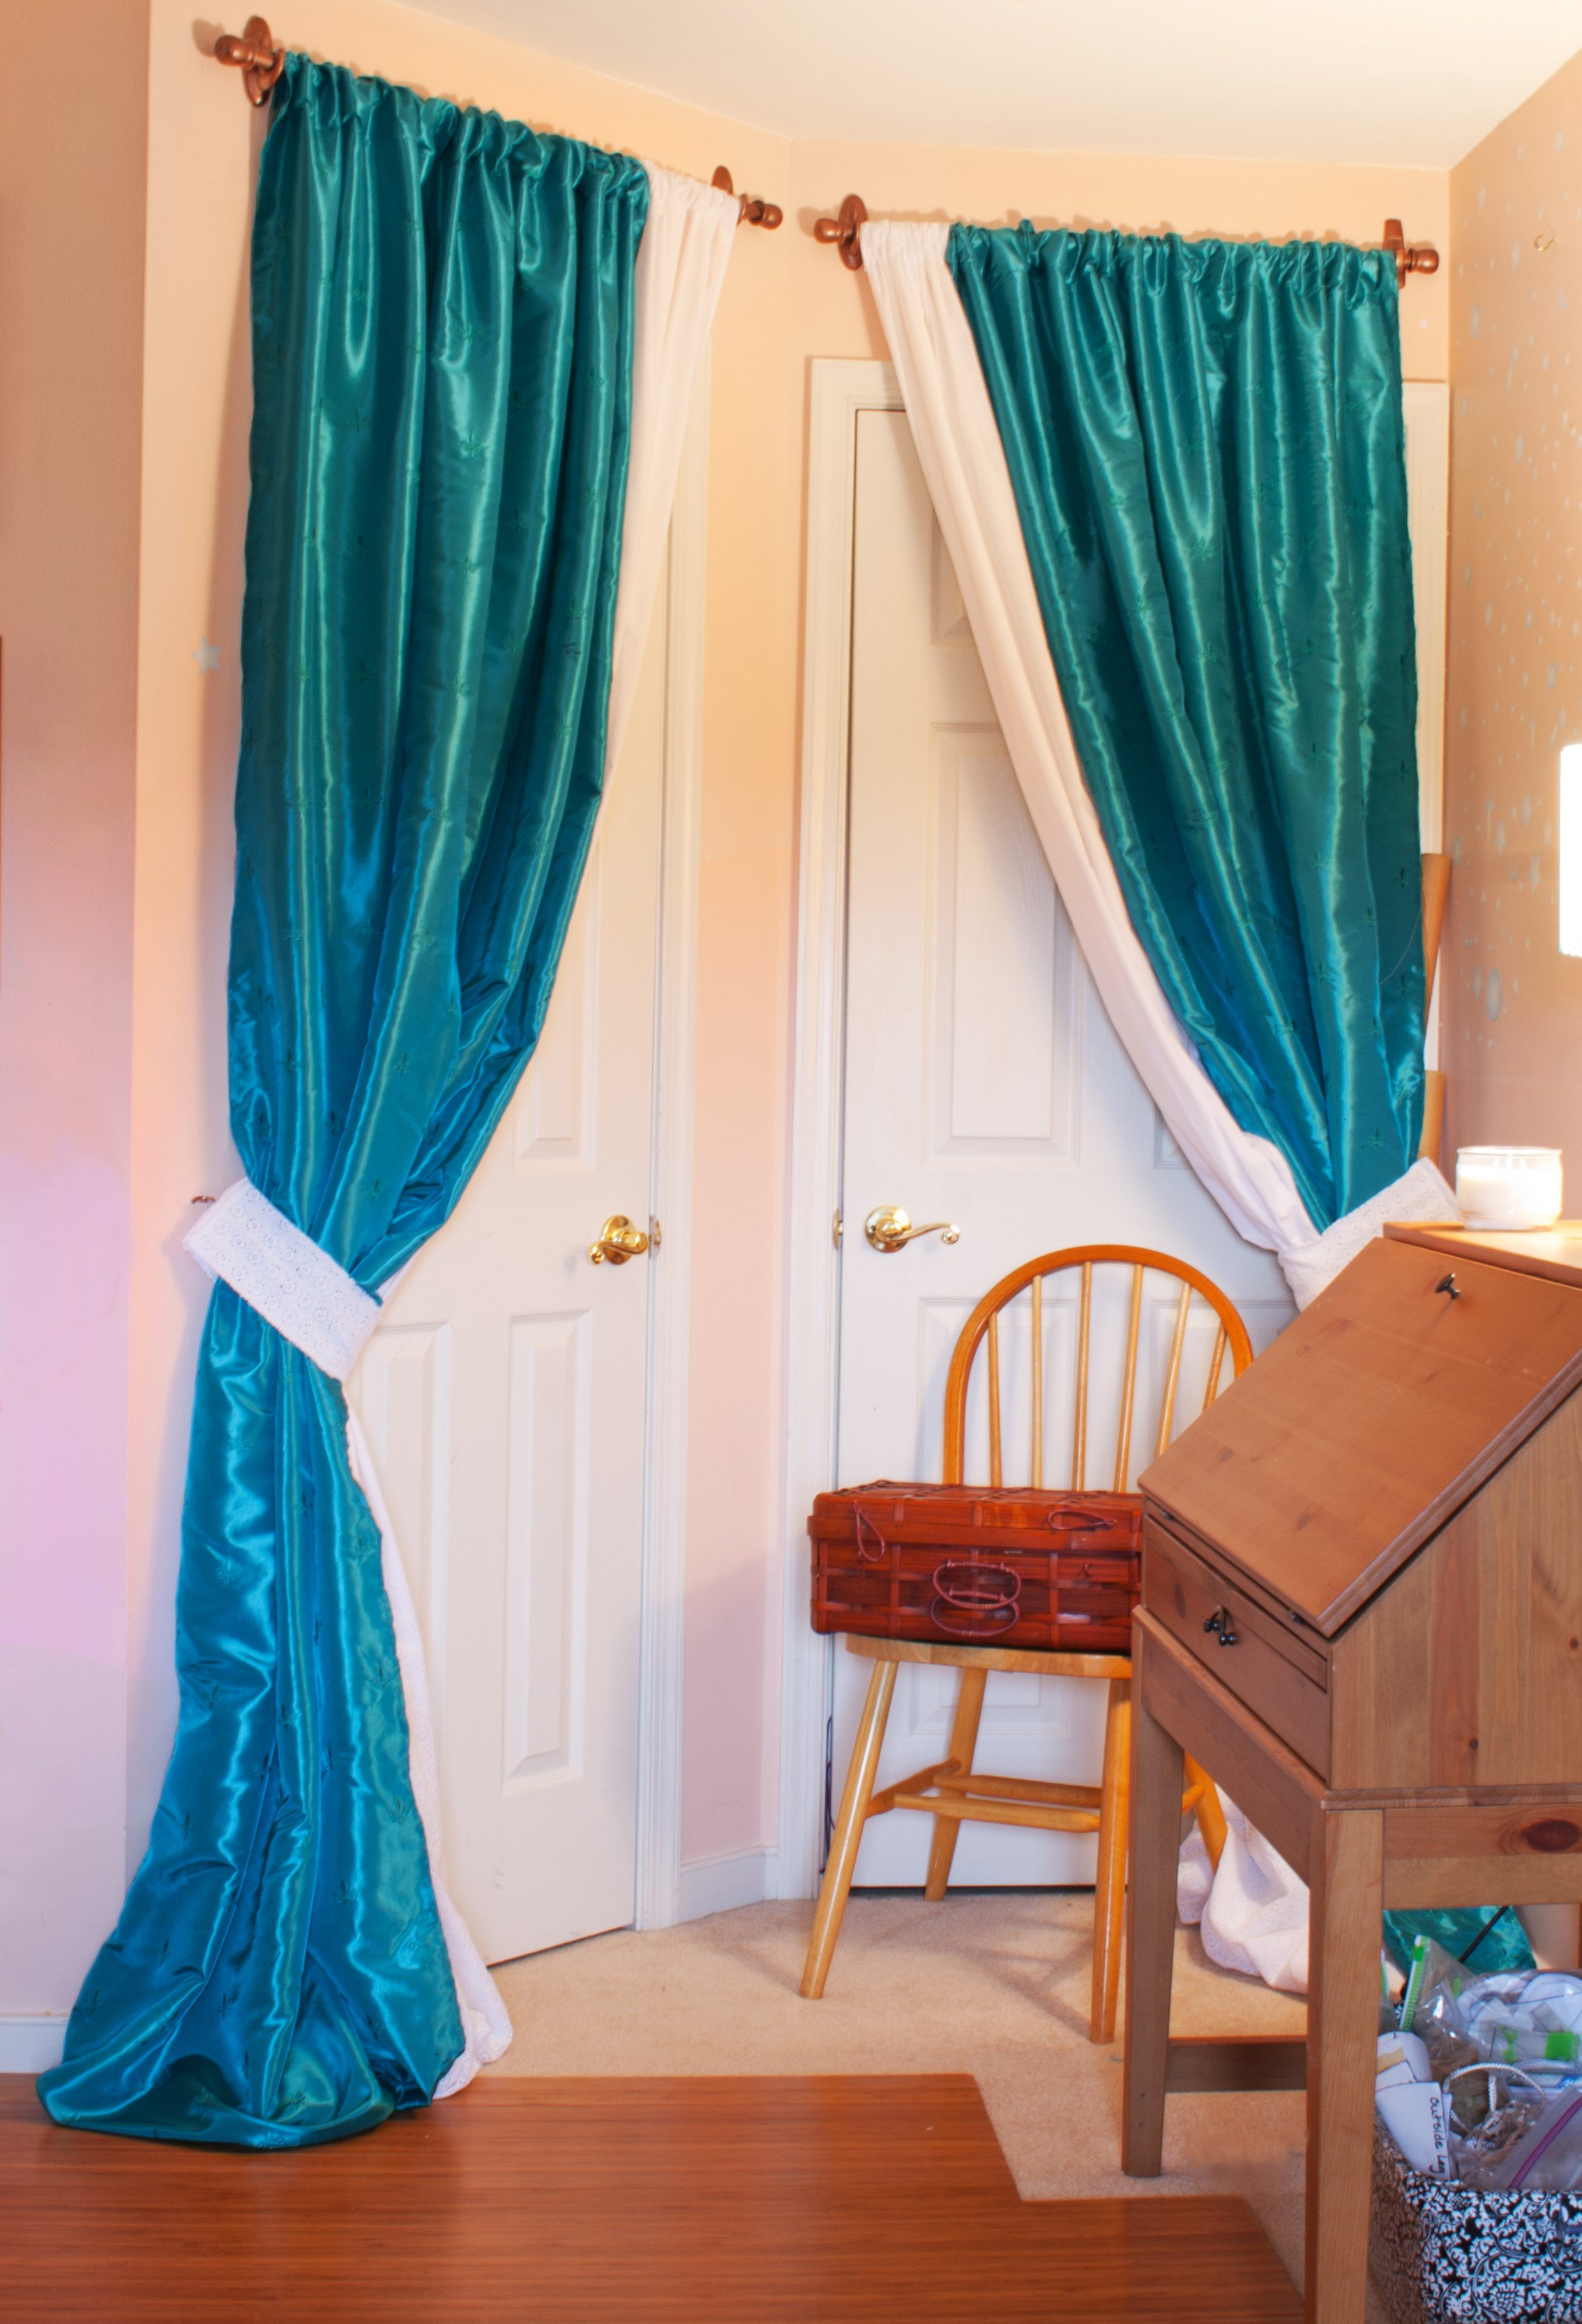 Diy Sewing Room Glam Up Series Closet Door Drapes And